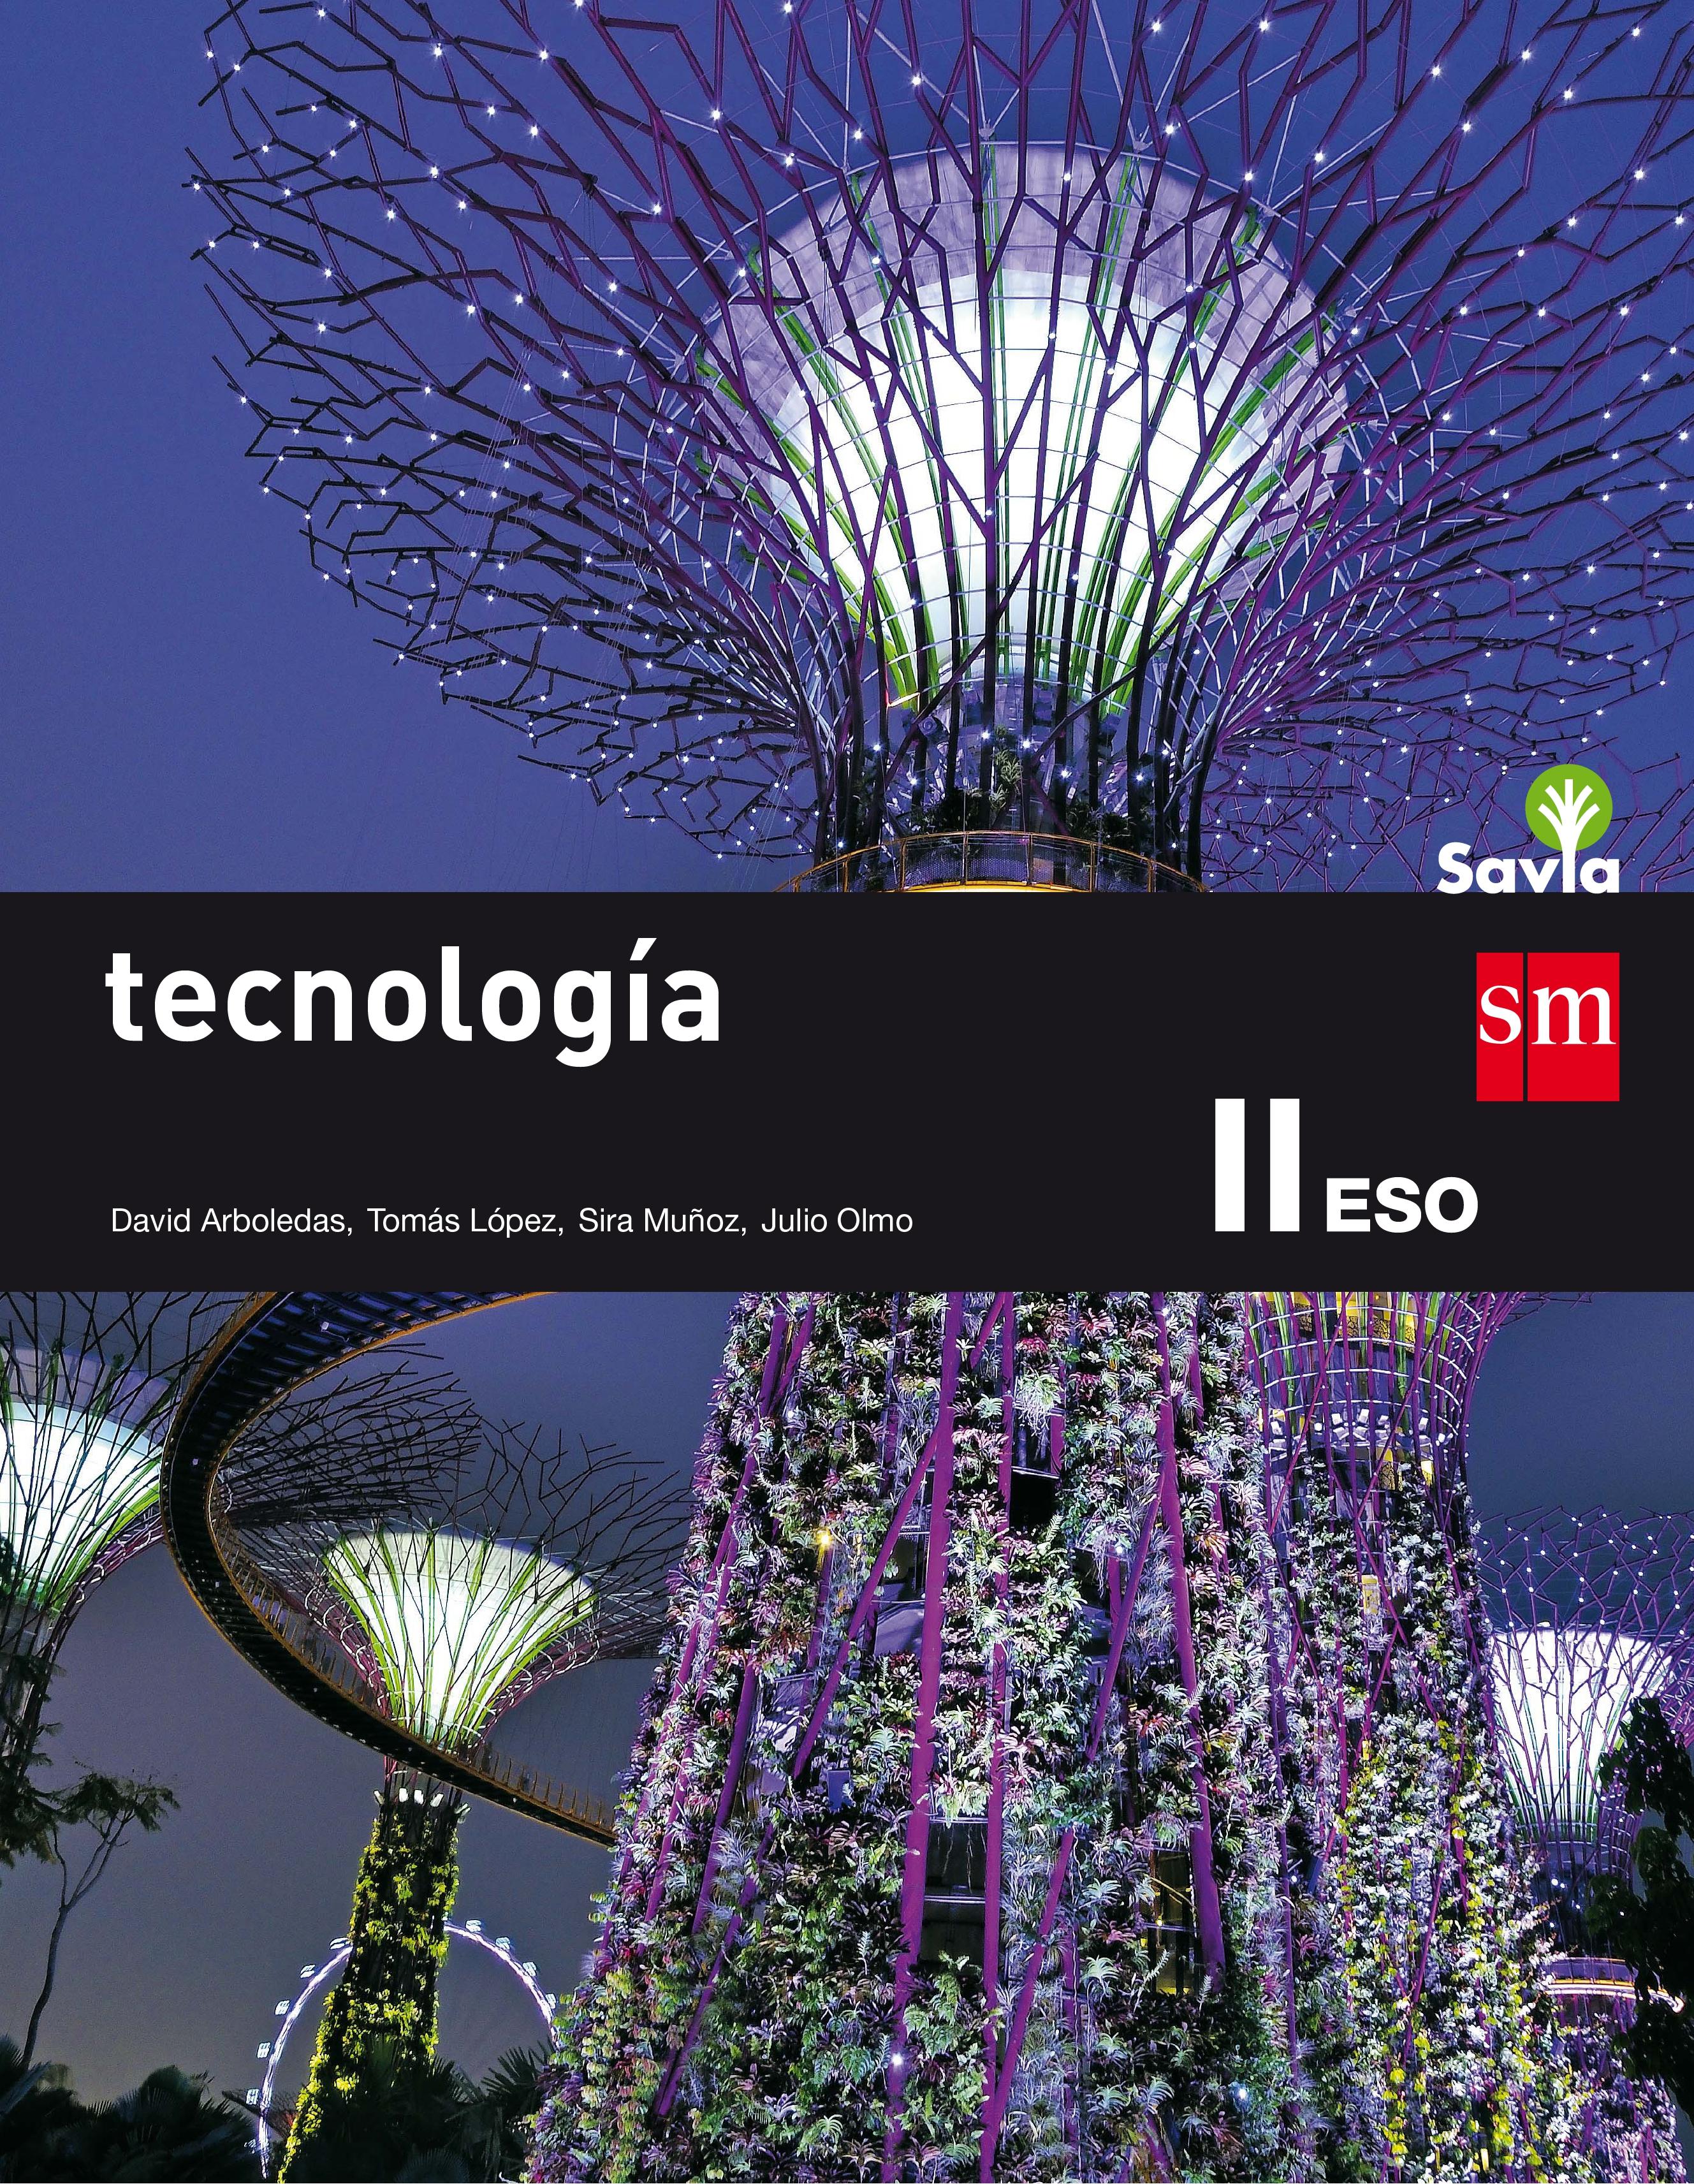 TECNOLOGÍA II. ESO. SAVIA